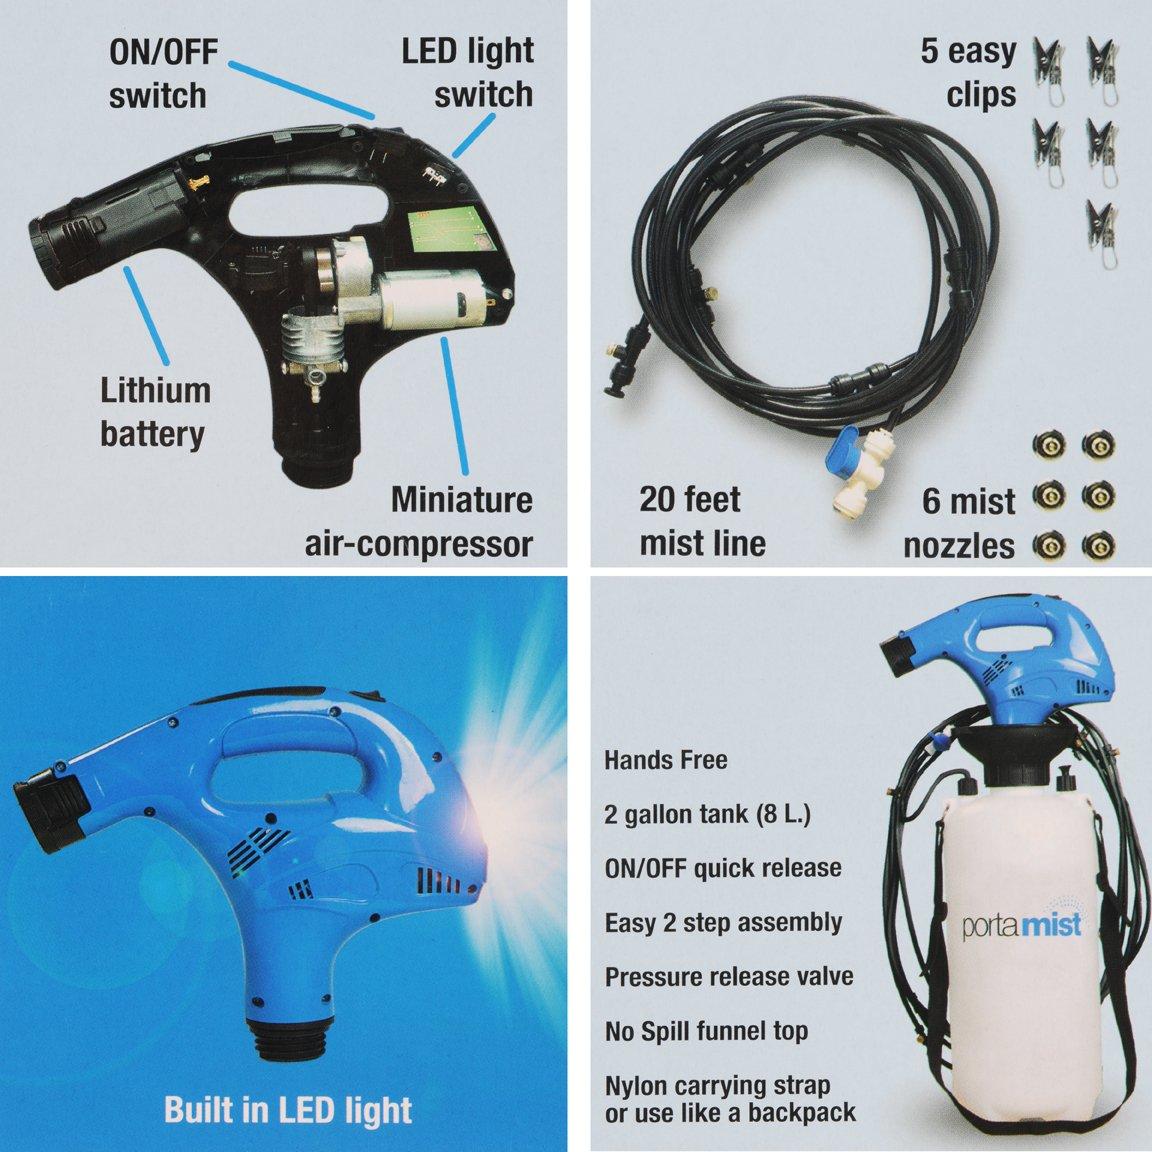 Porta Mist Portable Misting System 12V rechargeable